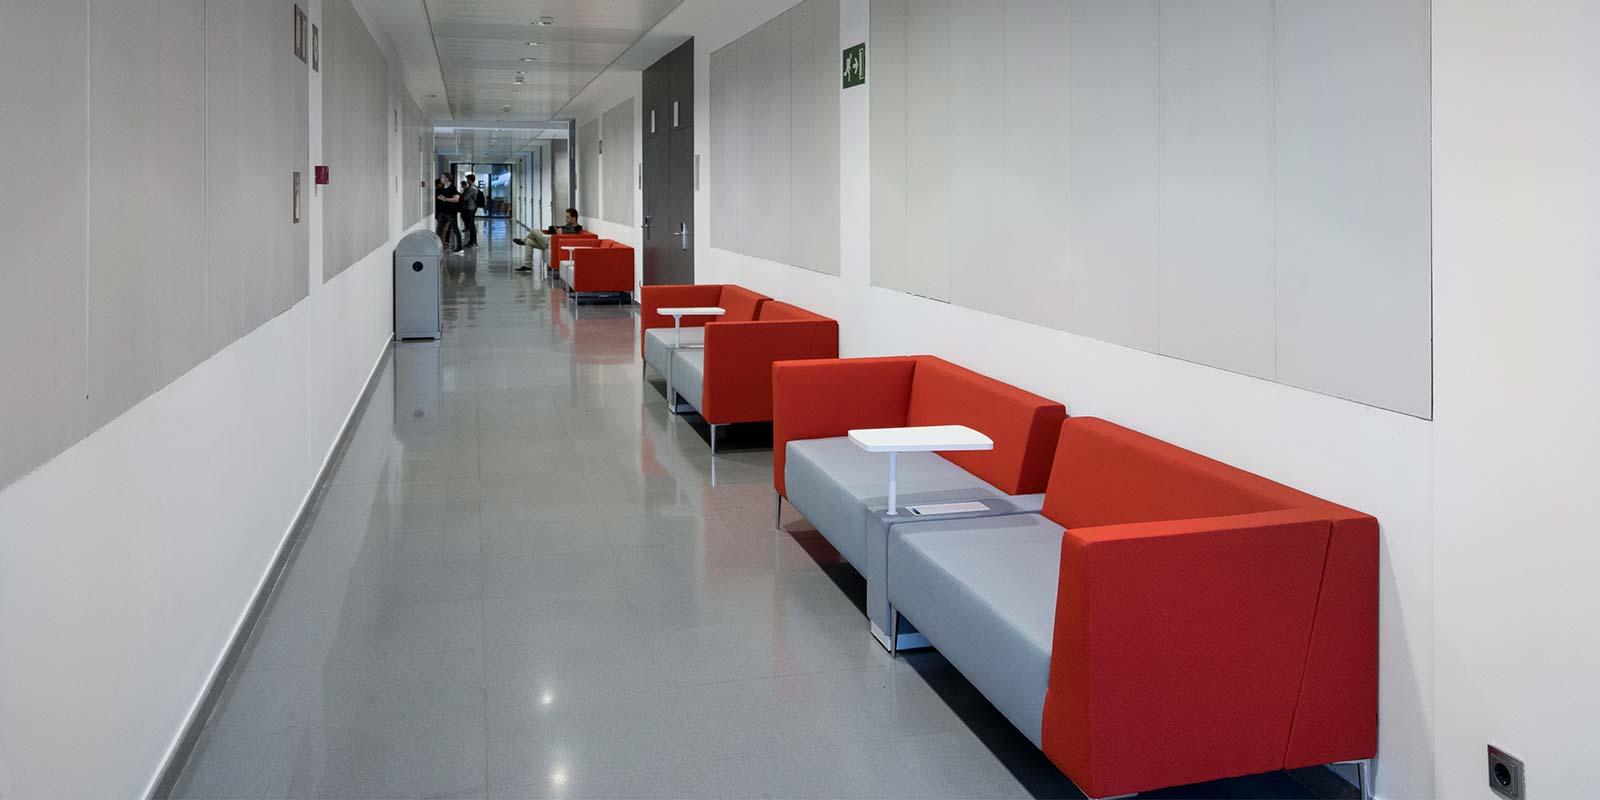 Esade Business School 1